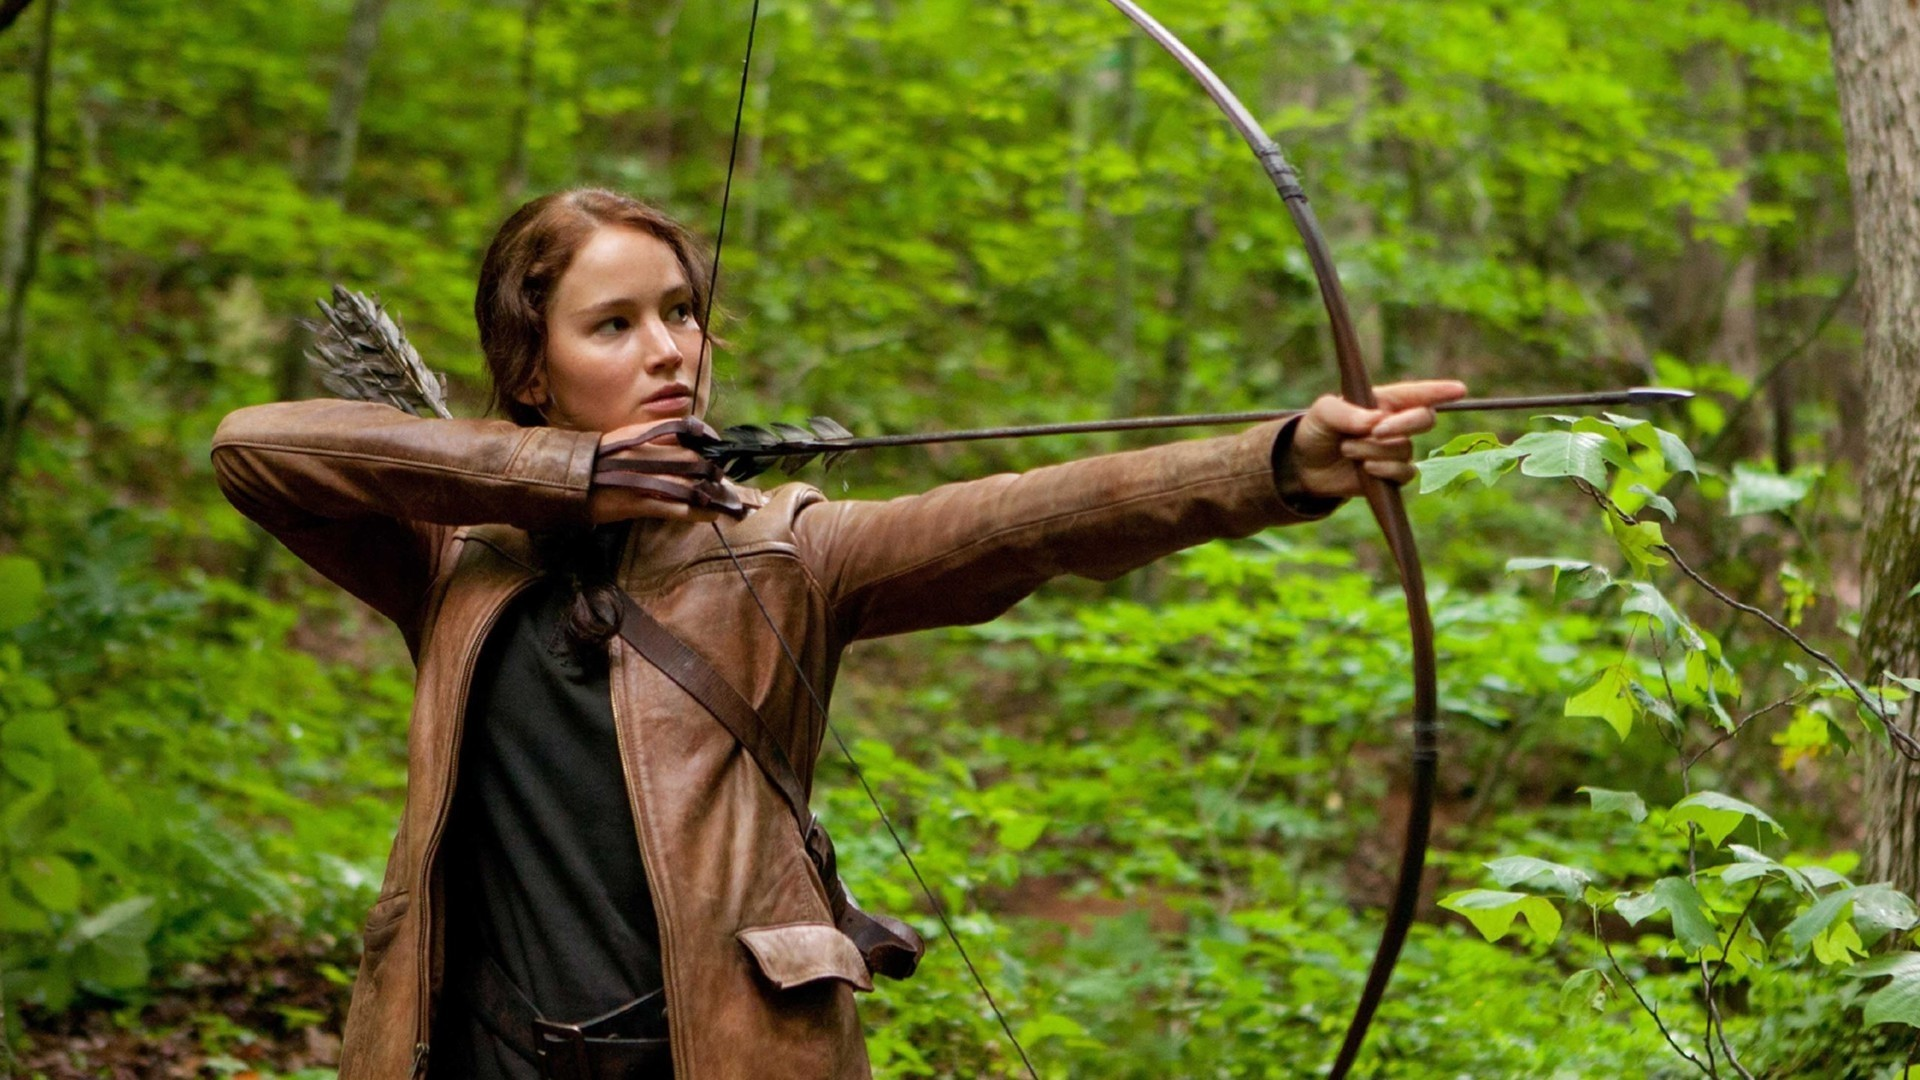 Archery wallpaper for pc